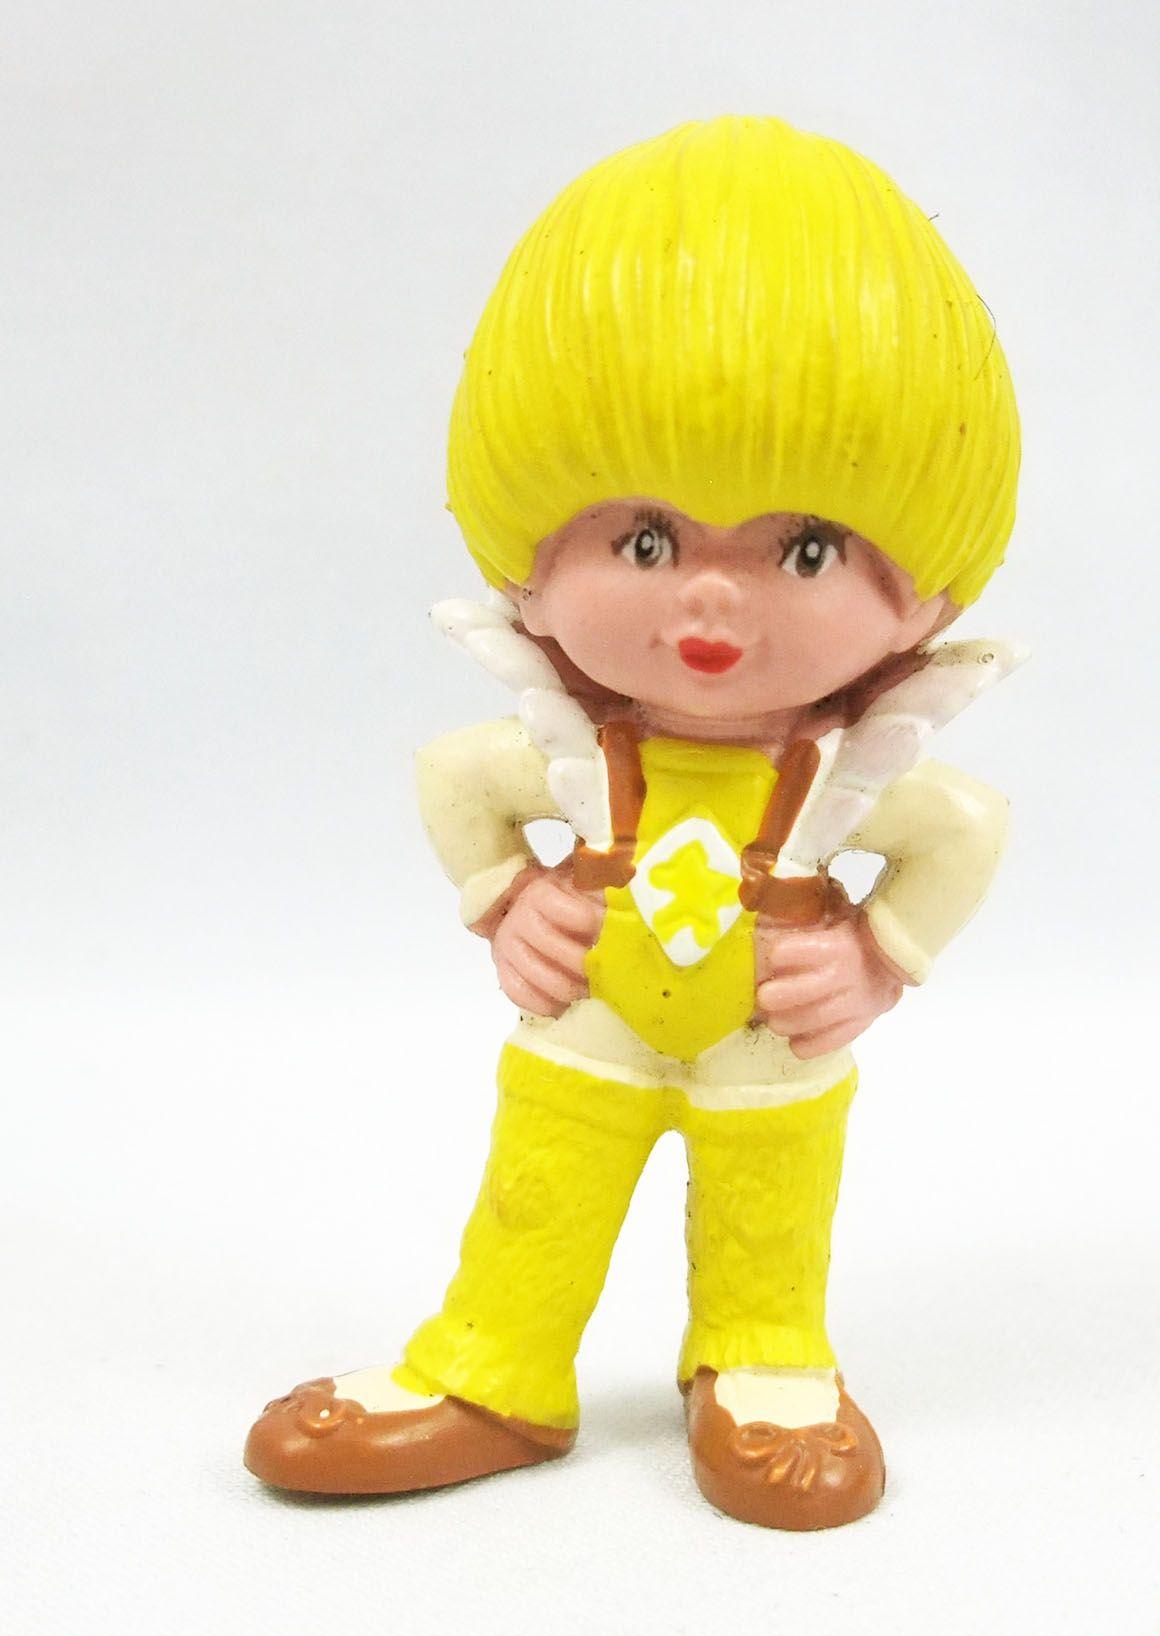 Rainbow Brite - Schleich - Canary Yellow - PVC figure